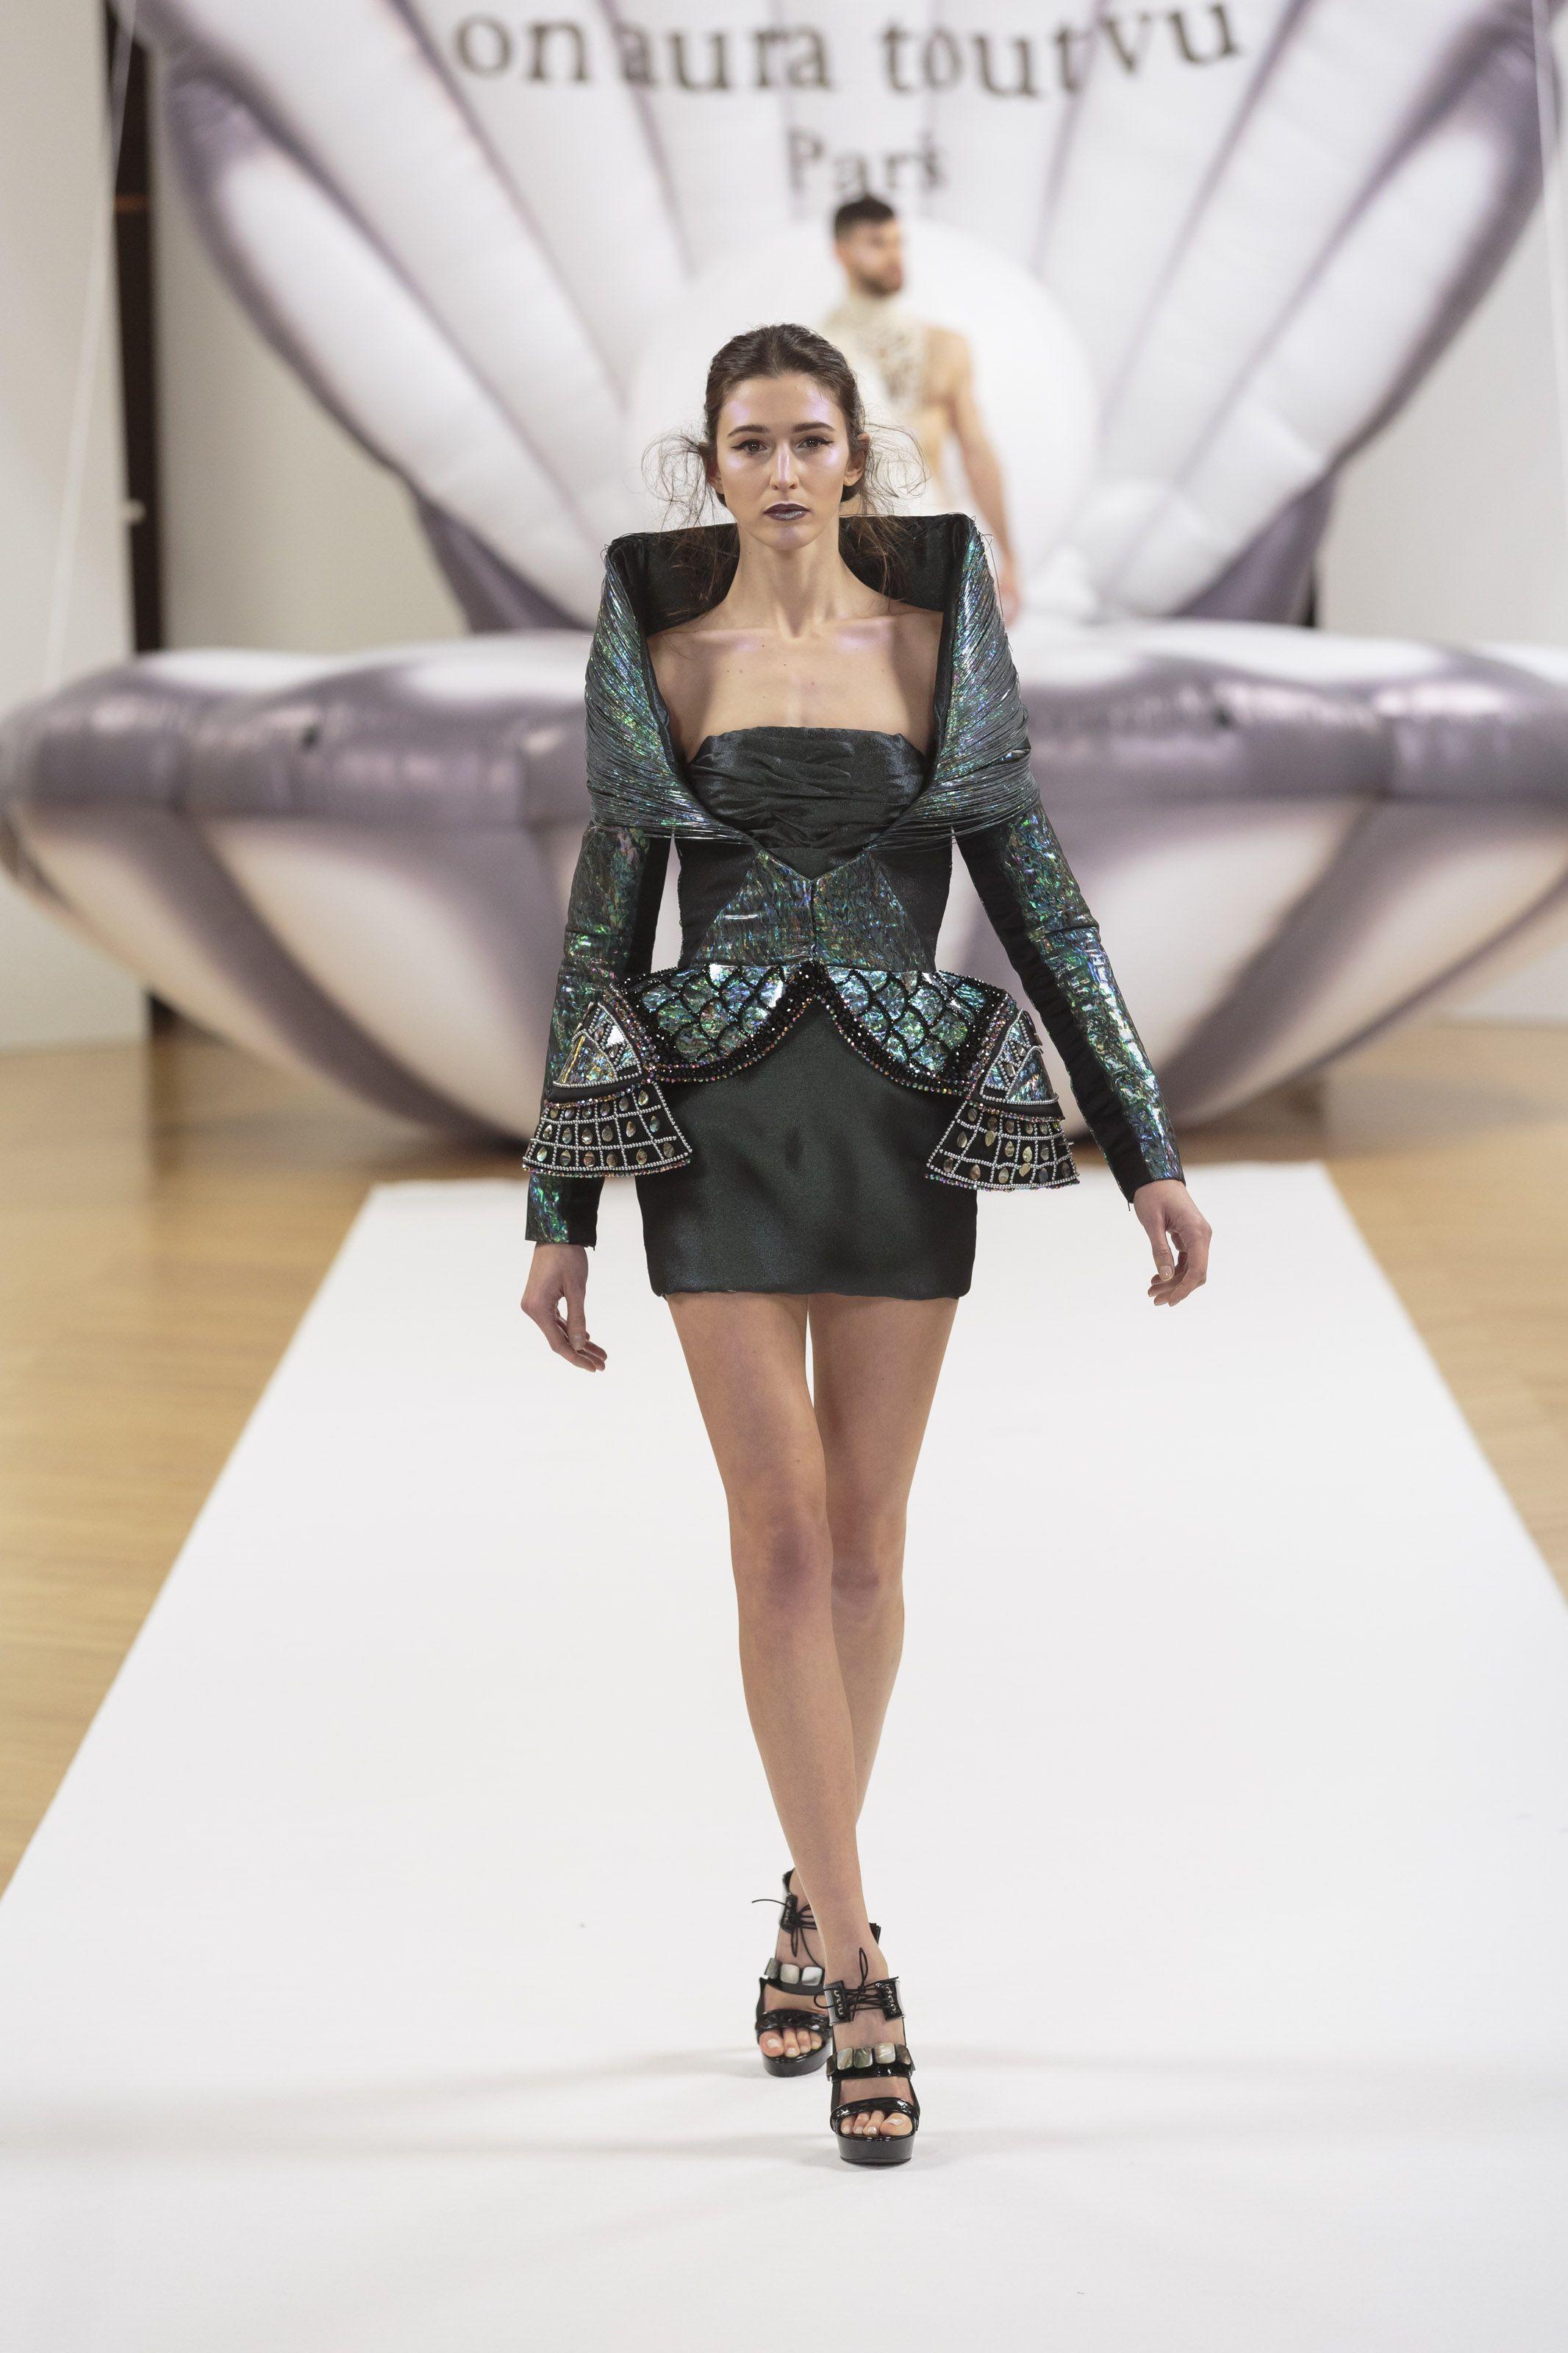 "ON AURA TOUT VU ""Otohime"" SS17 - Look 14 #onauratoutvu #parisfashionweek #otohime #ss #collection #springsummer #2017 #paris #mode #pfw #model #couture #dress"